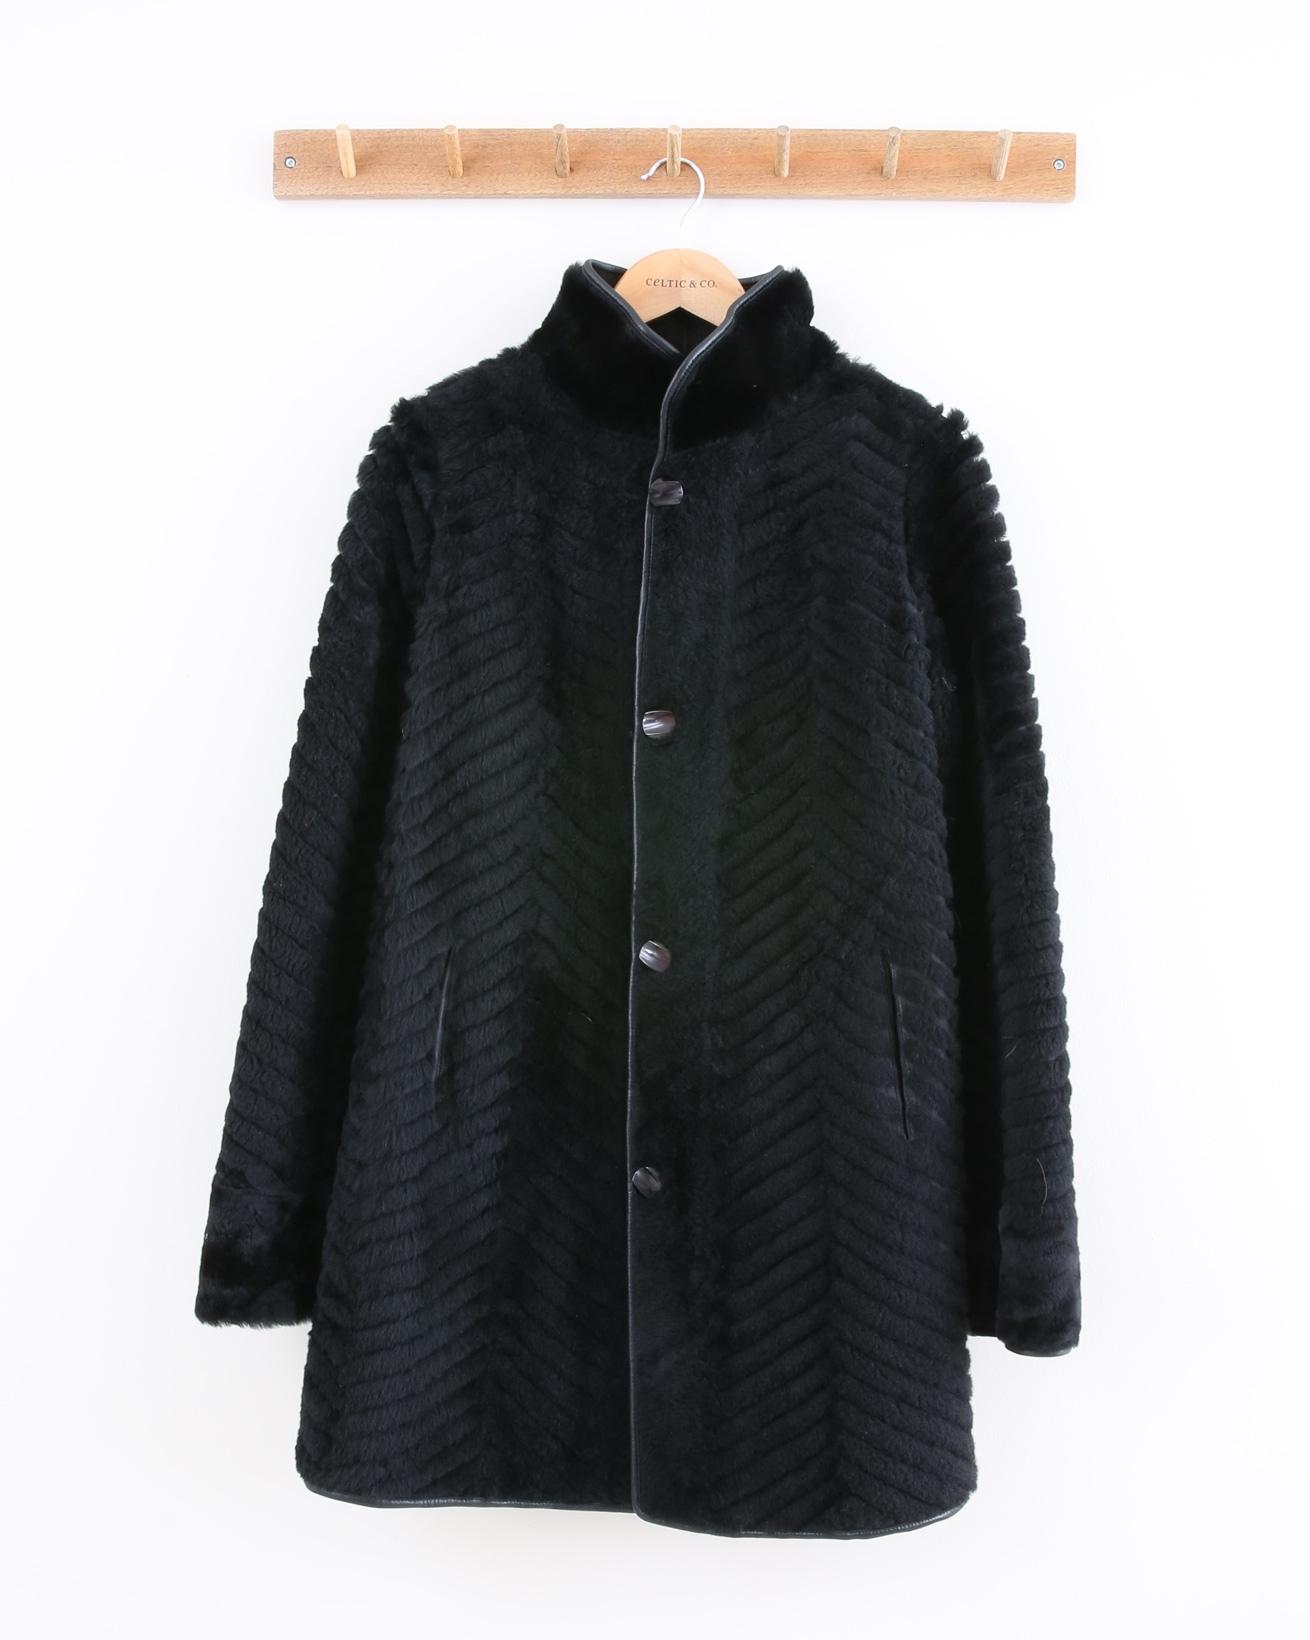 1491-reversible-chevron-sheepskin-coat--black.jpg